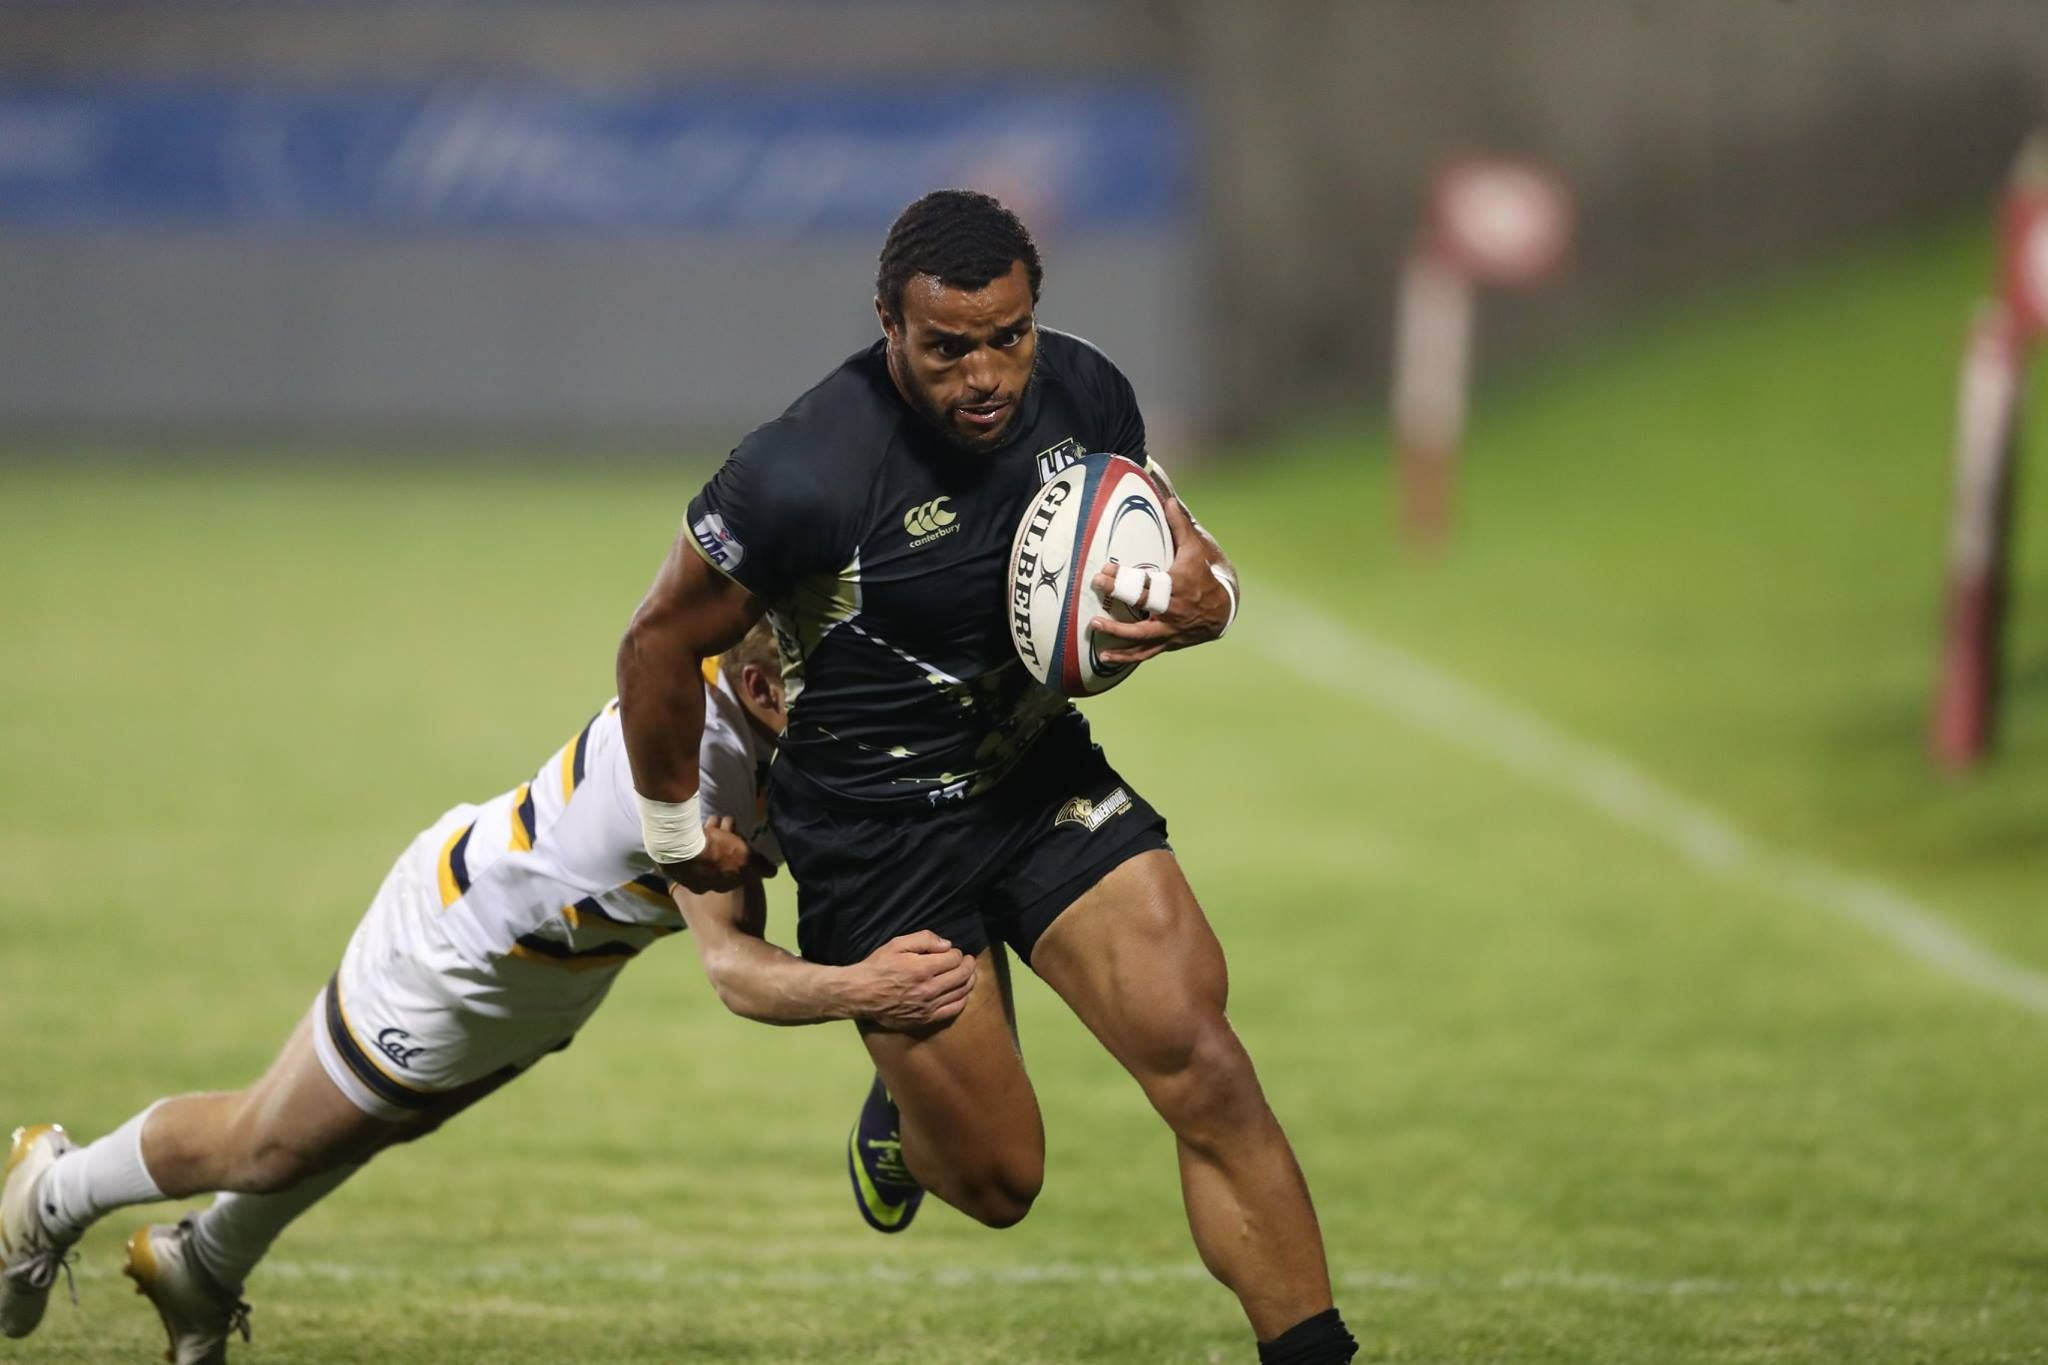 Image Result For Navy Midshipmen Rugby Short Navy Midshipmen Rugby Shorts Midshipmen